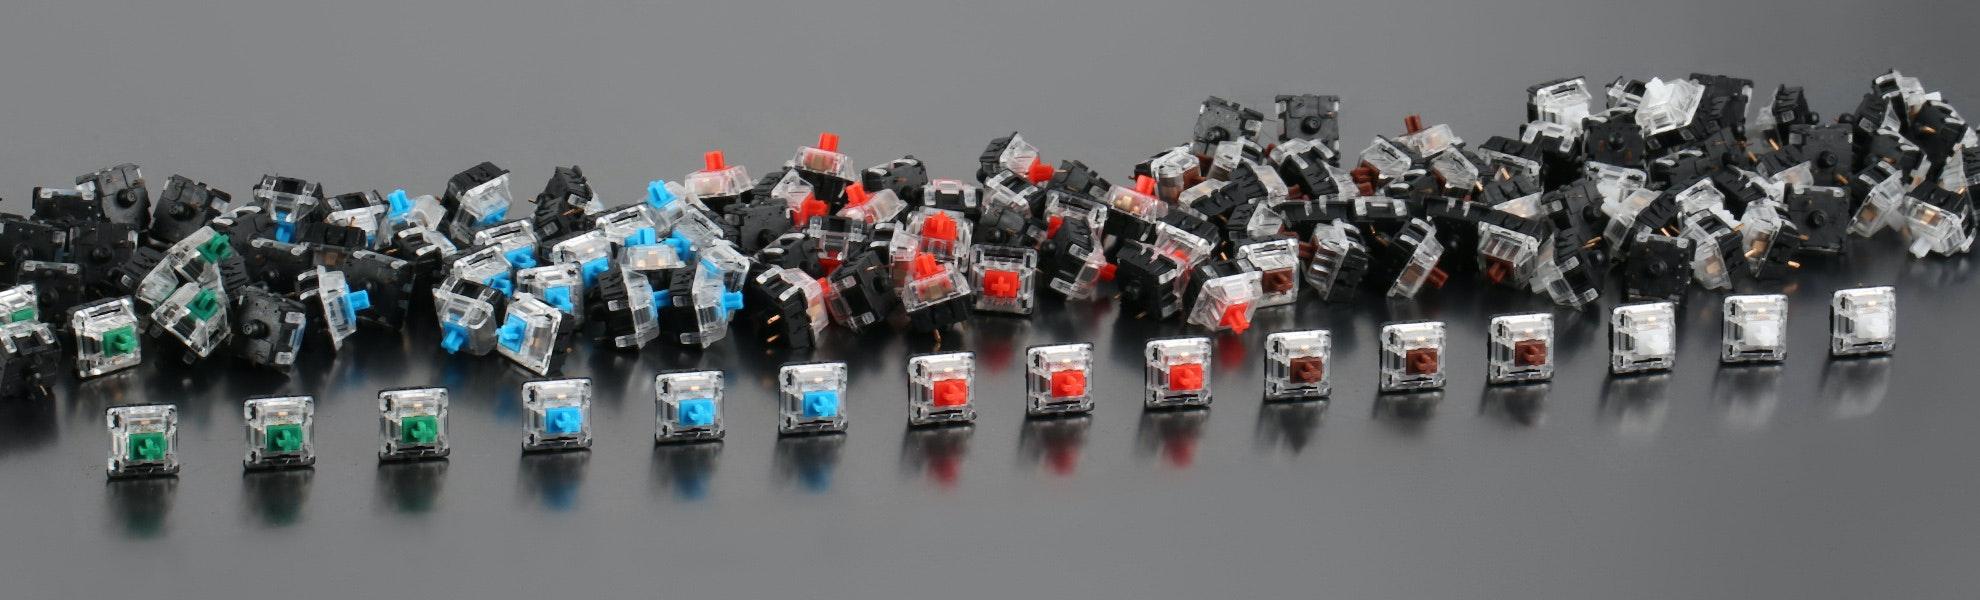 Gateron Switches (120 Pieces)